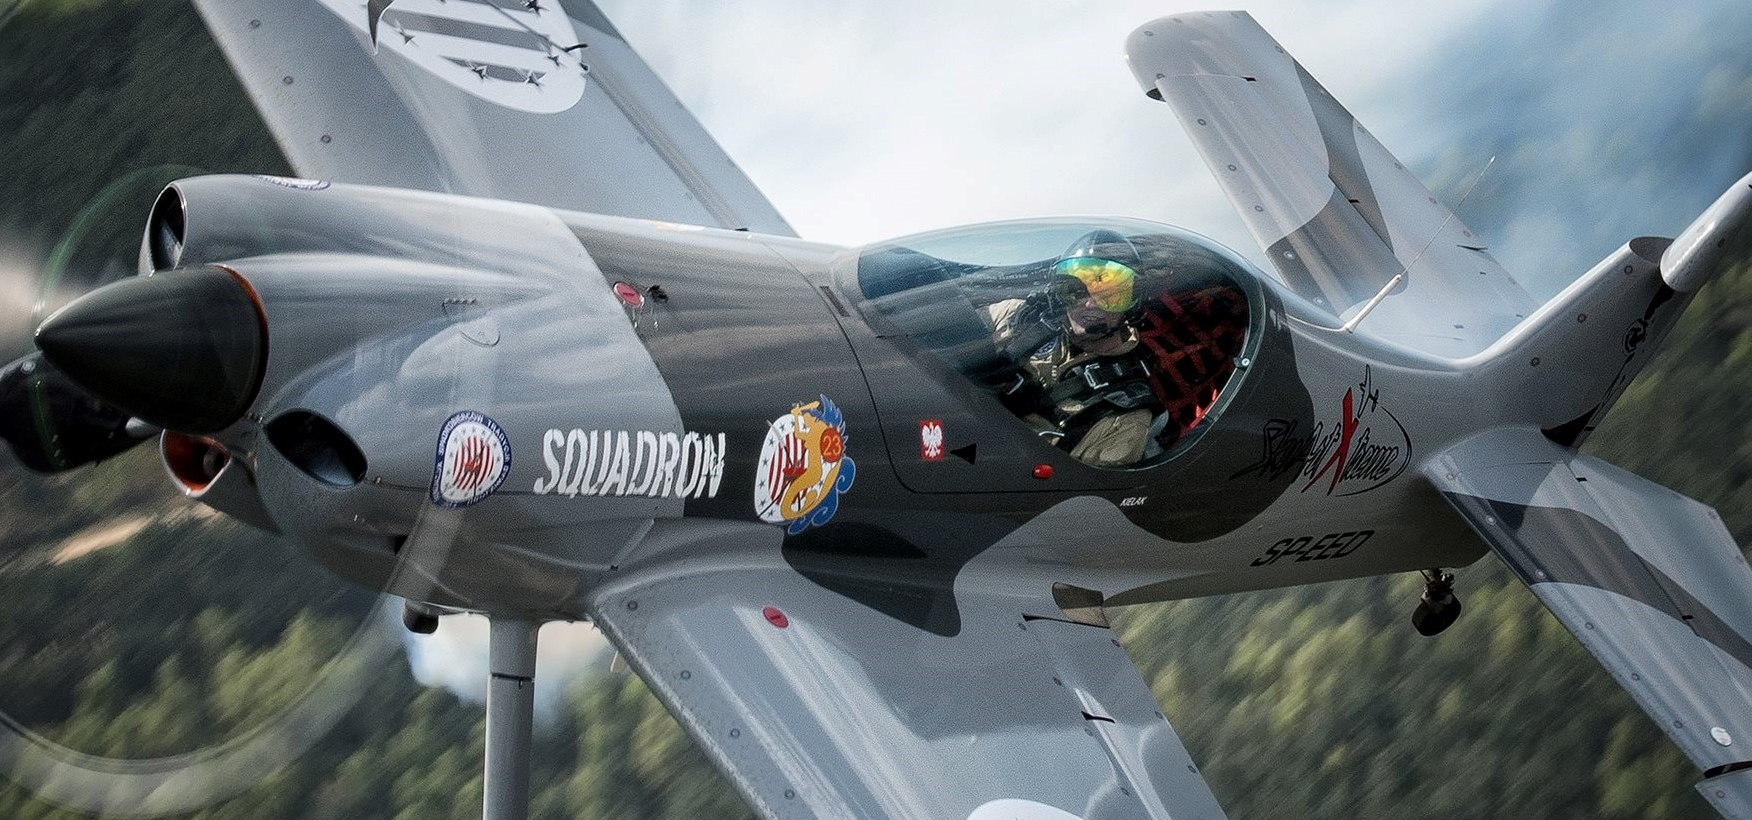 samolot soliadron